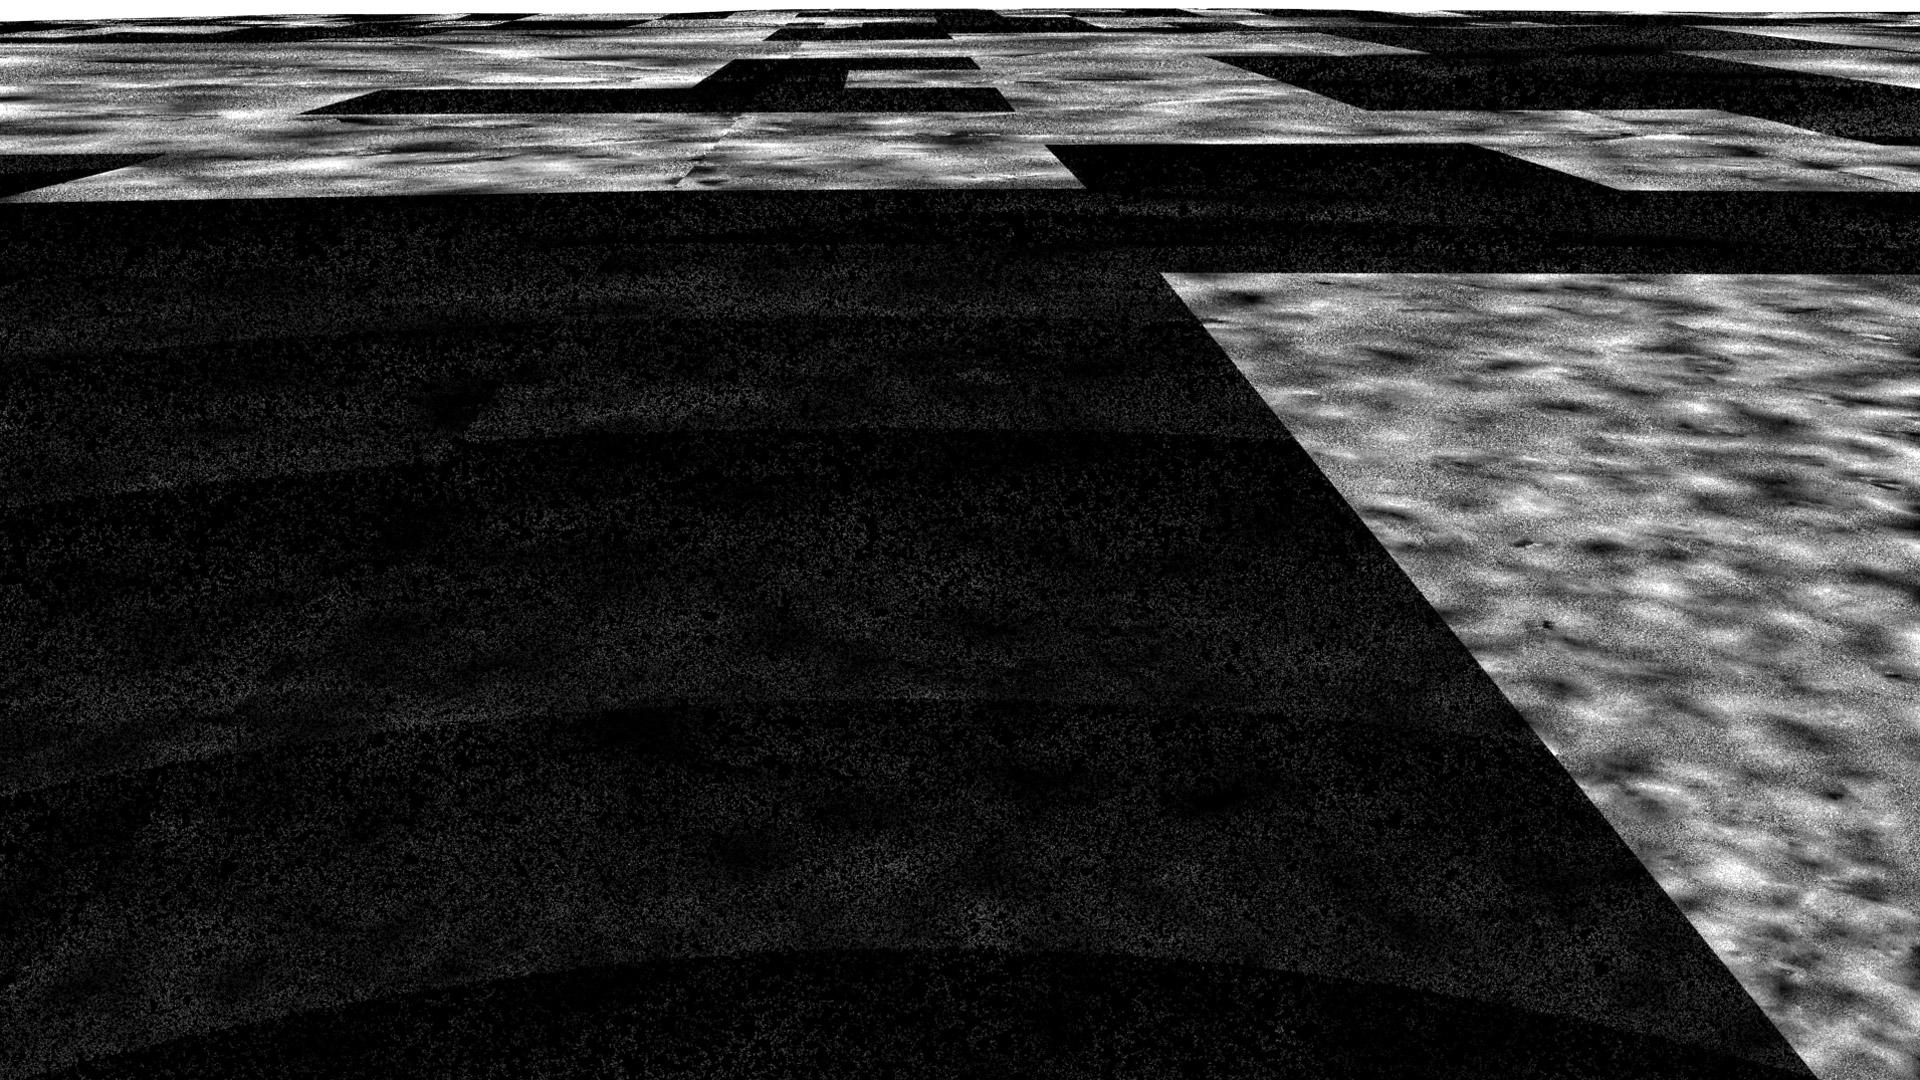 2_Desert_fleuryfontaine_Galdric-Fleury-Antoine-Fontaine_2010_Web